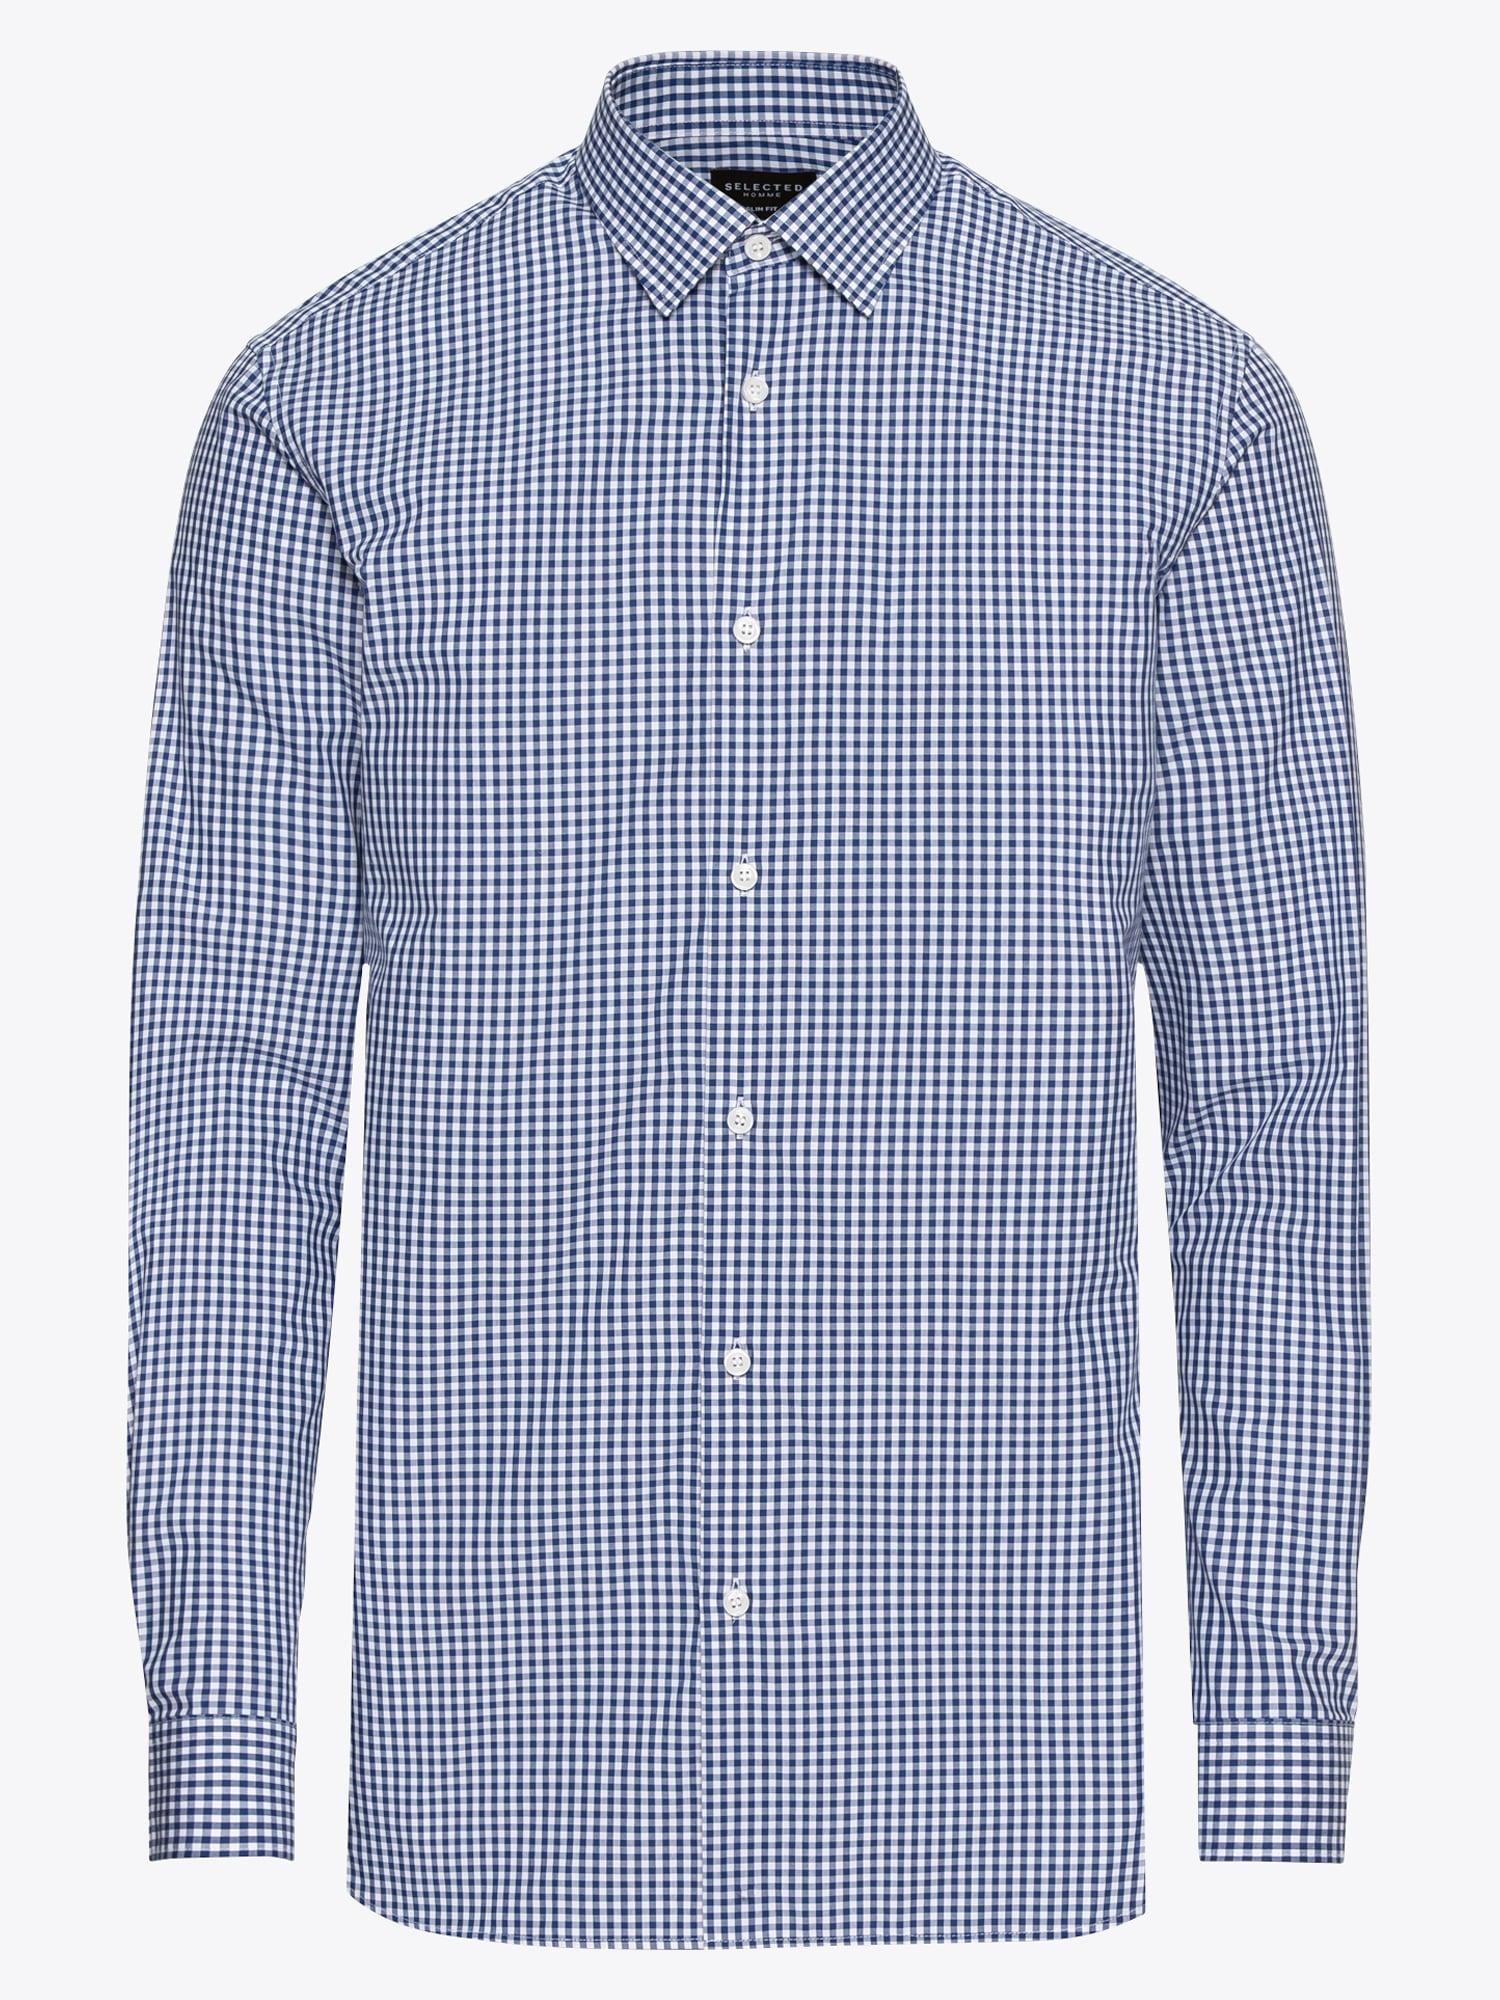 Donkerblauw Heren Overhemd.Selected Homme Heren Overhemd Donkerblauw Wit Shop Via Mode